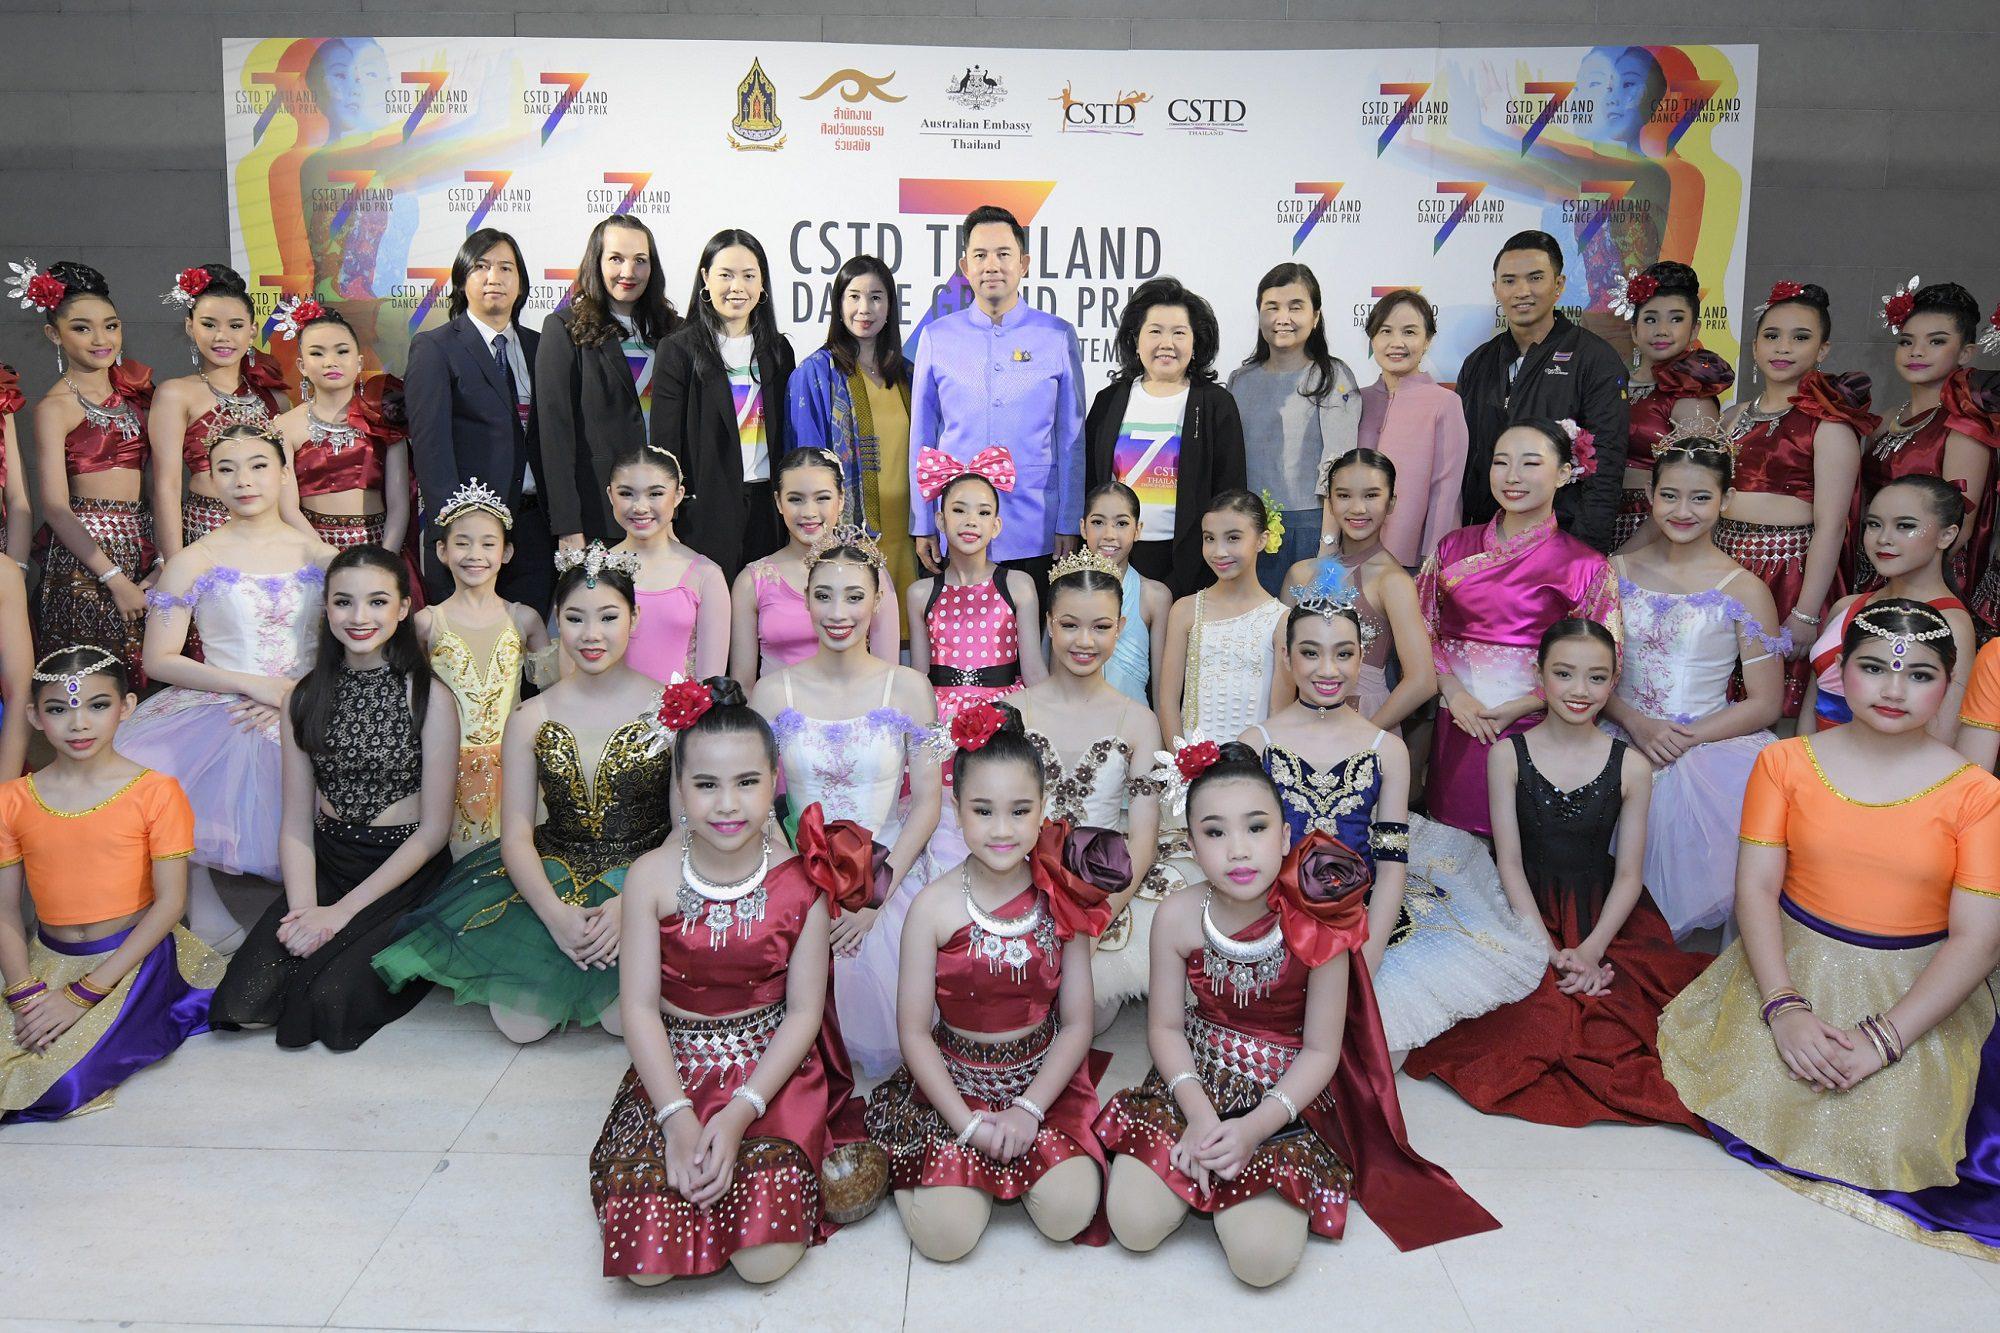 CSTD ประเทศไทย ร่วมกับกระทรวงวัฒนธรรม จัดงาน 7th CSTD Thailand Dance Grand Prix 2020